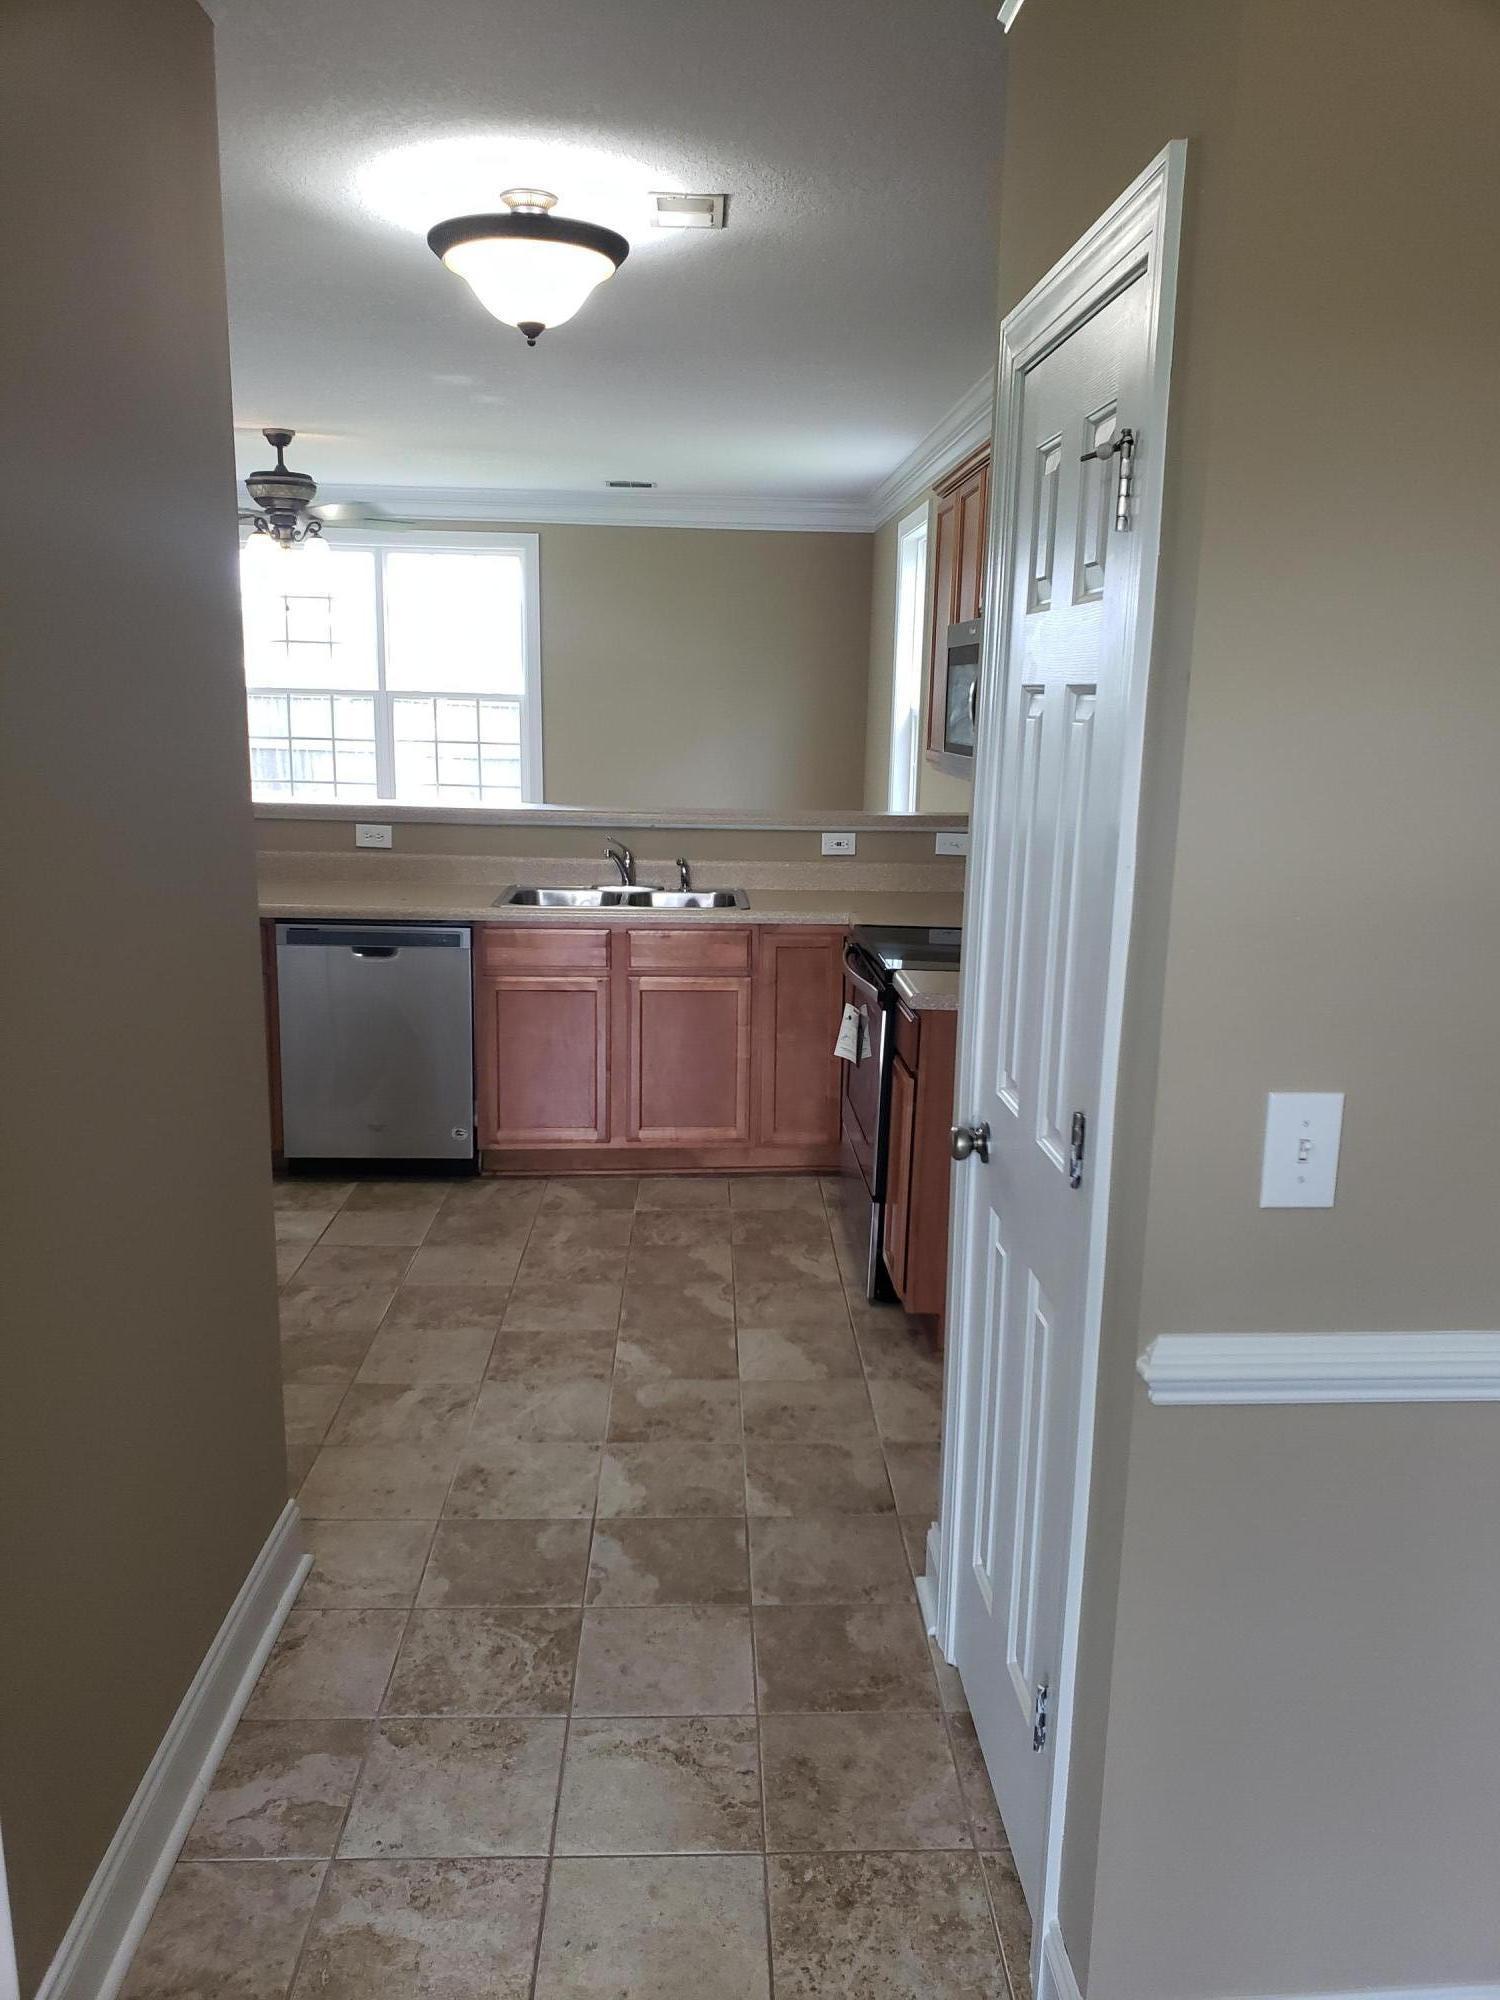 Montague Pointe Homes For Sale - 100 Gavins, Goose Creek, SC - 19